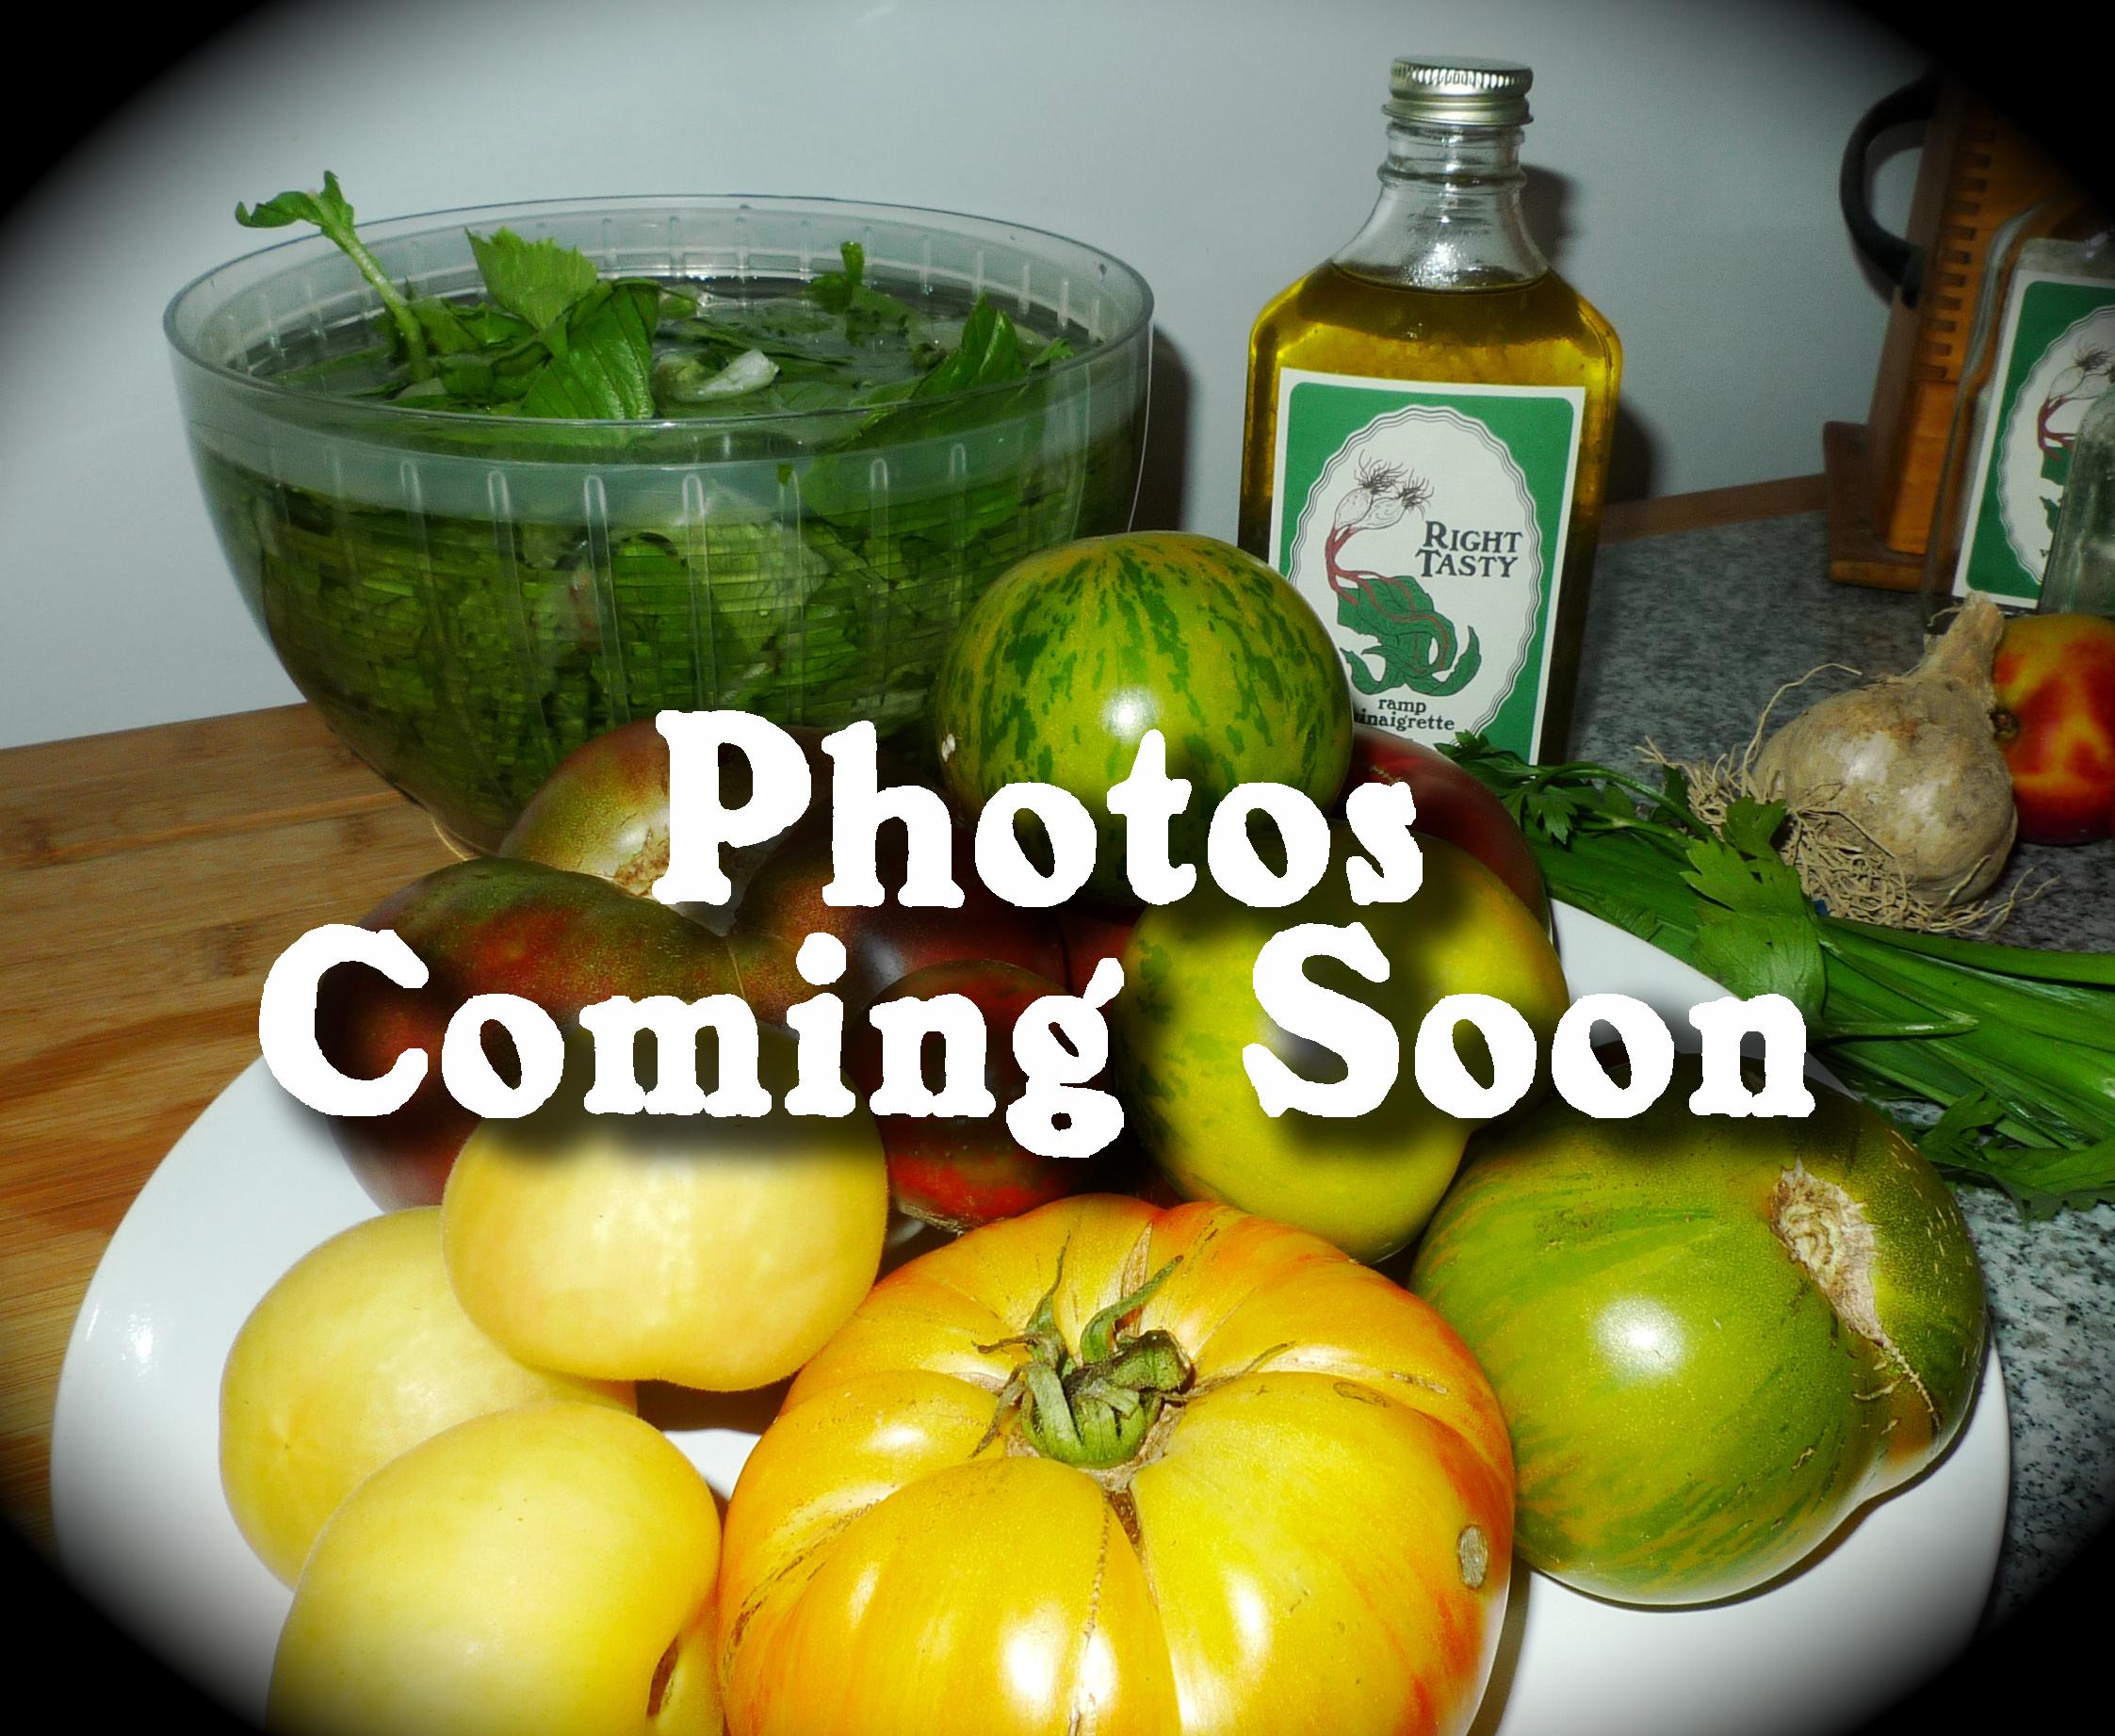 photos coming soon.jpg